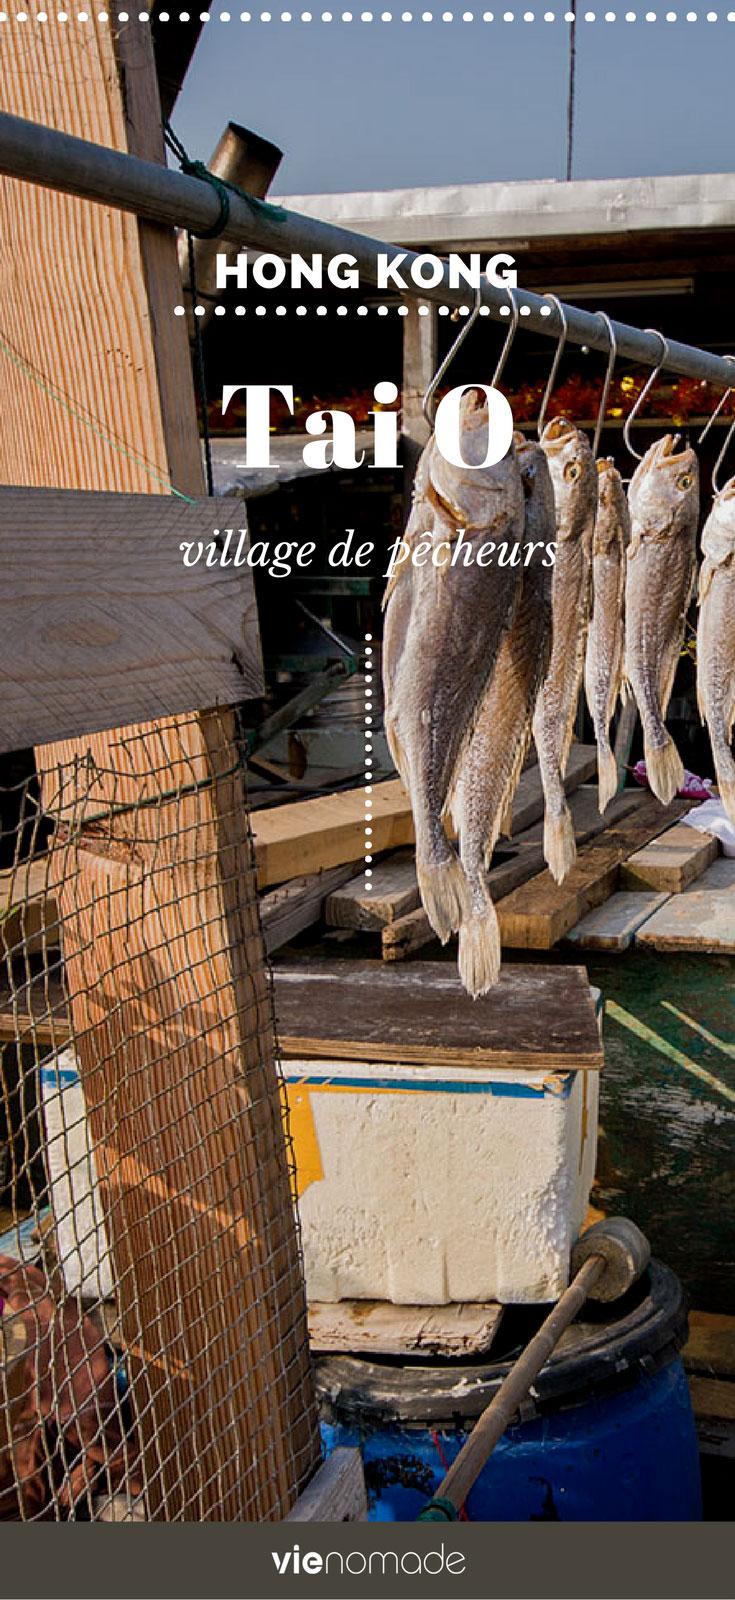 Hong Kong: découvrir Tai O, un village de pêcheurs